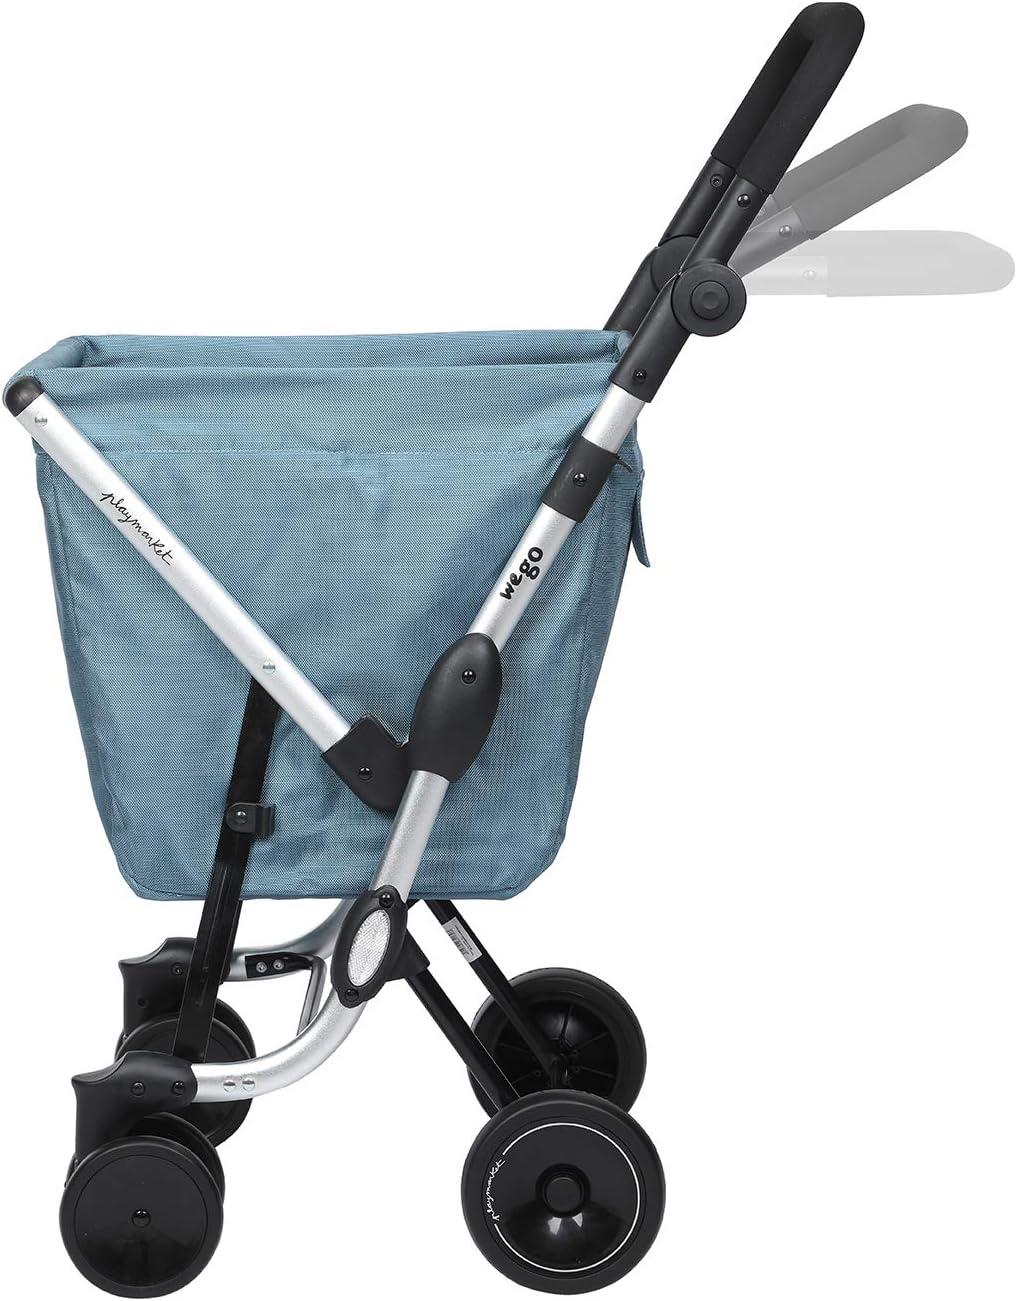 Bleu Playmarket We Go Basic Valise 97 cm Mist 50 liters